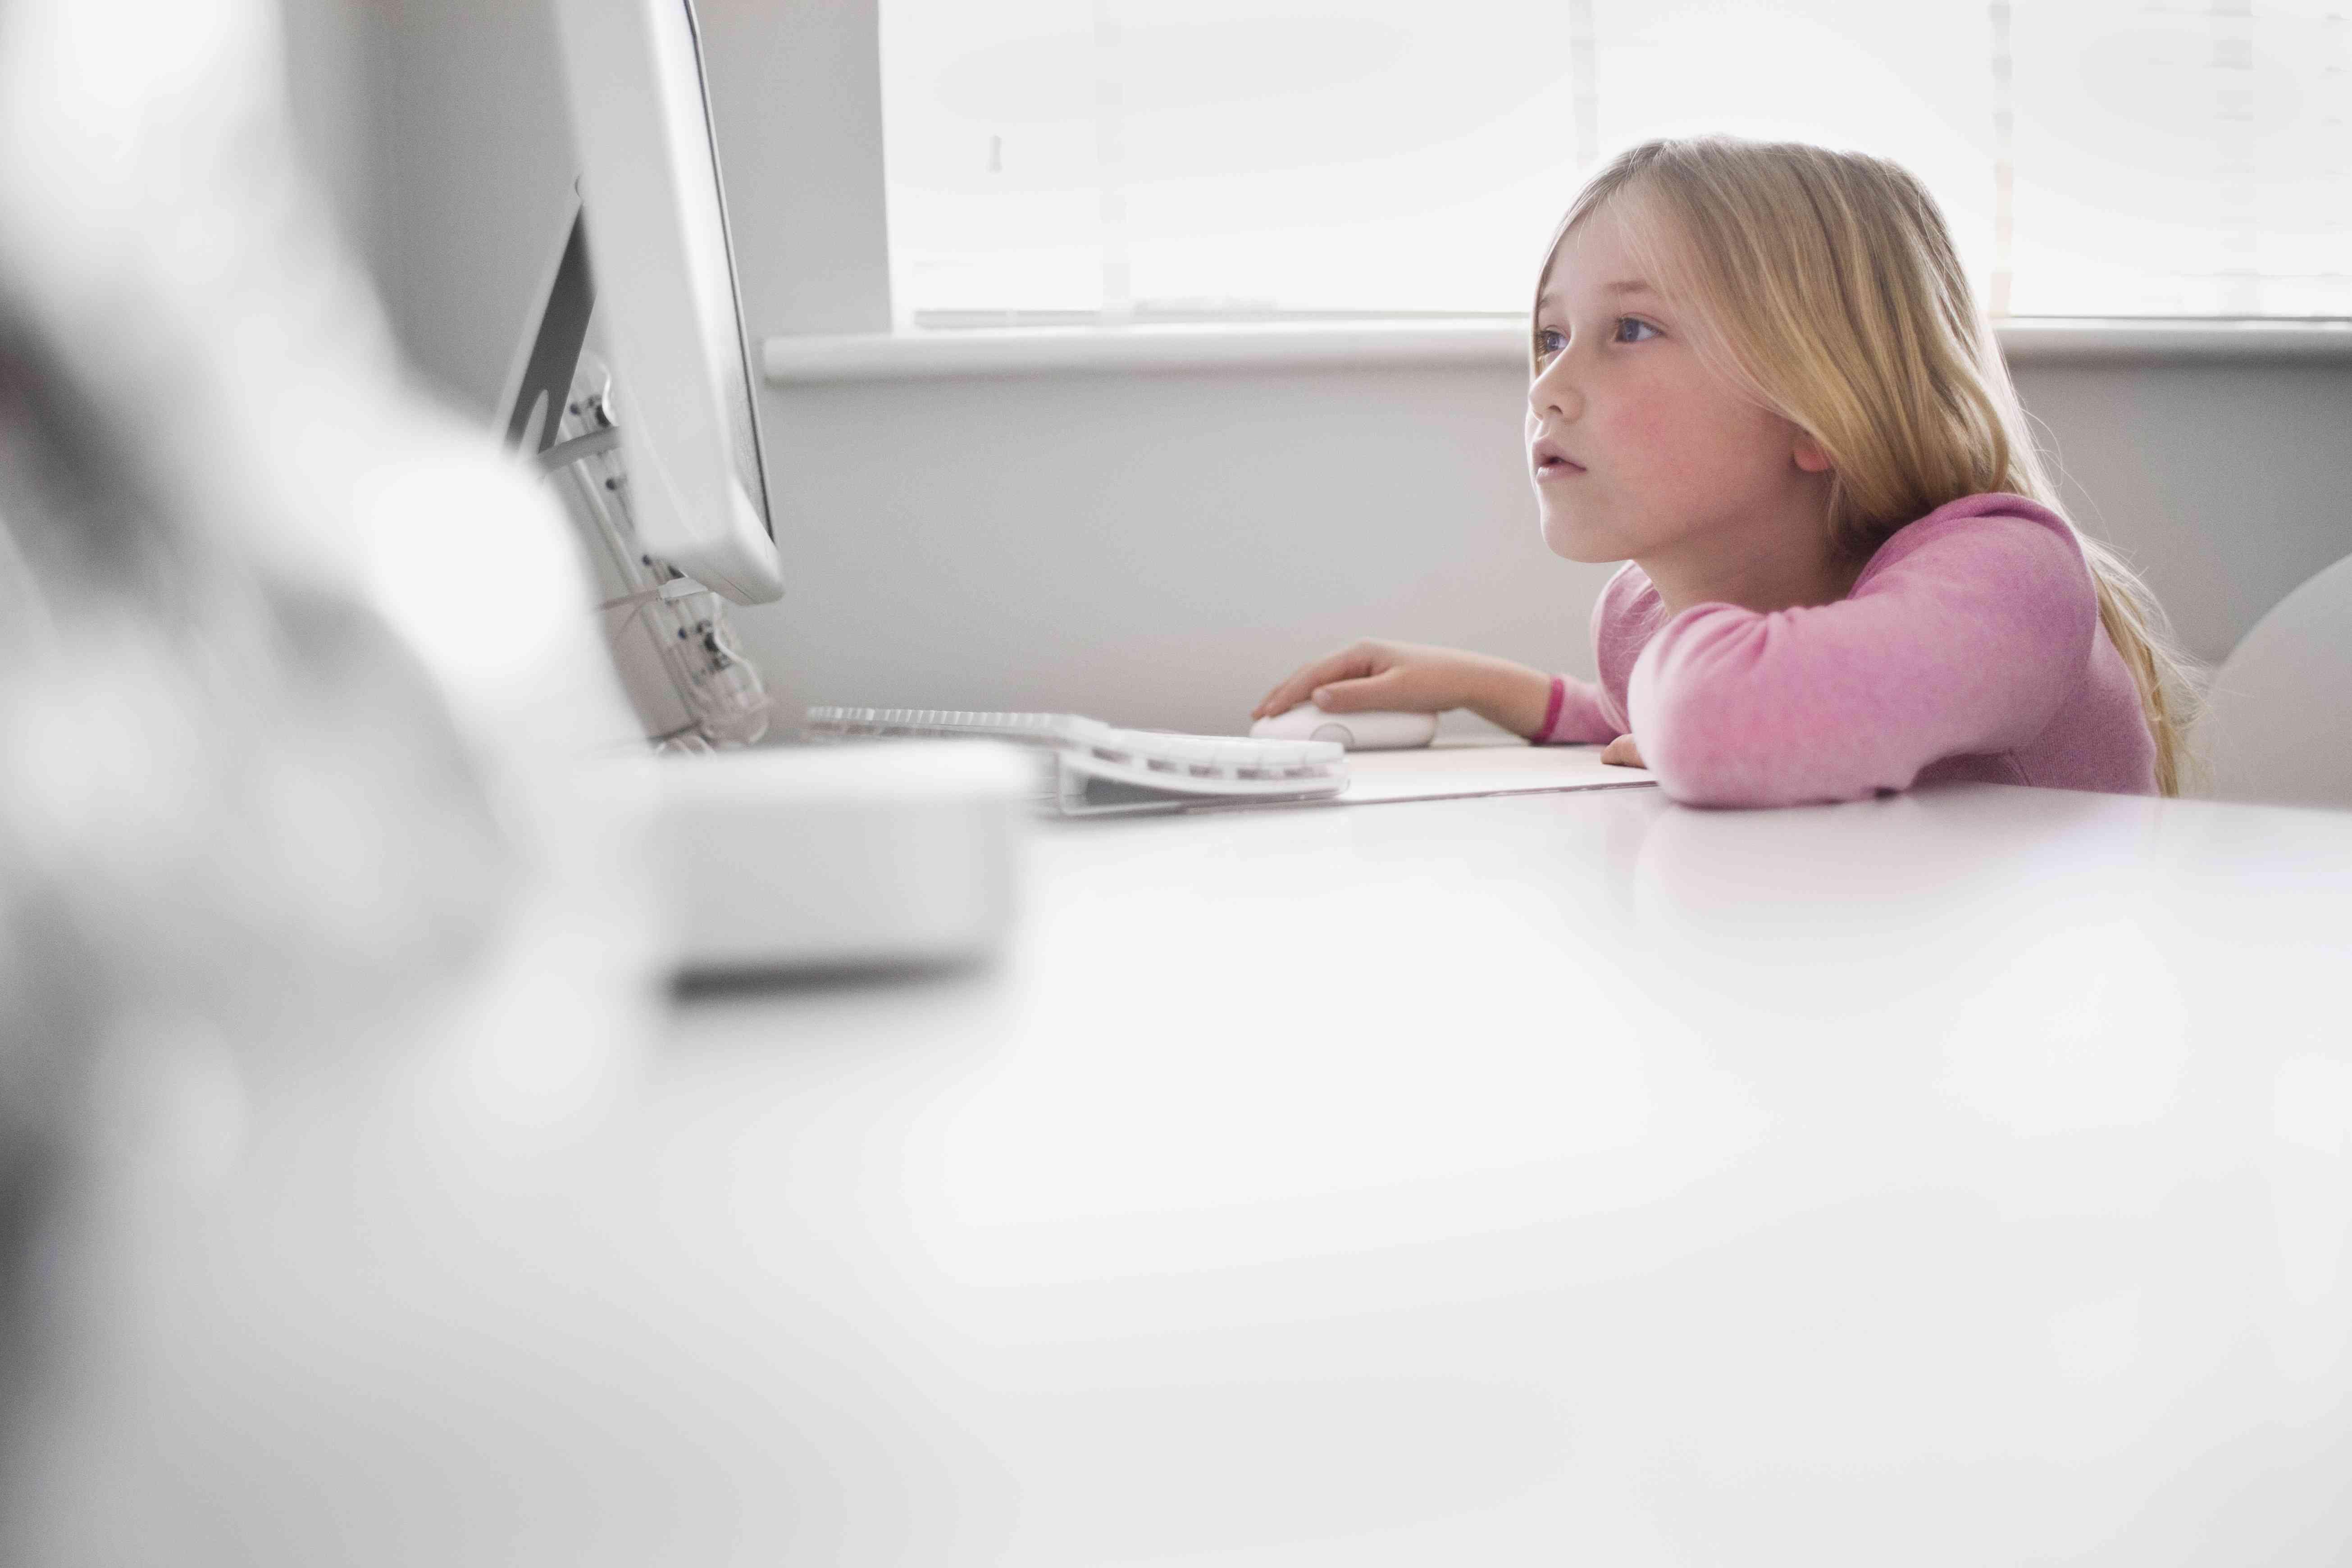 junk food ads online - girl on computer